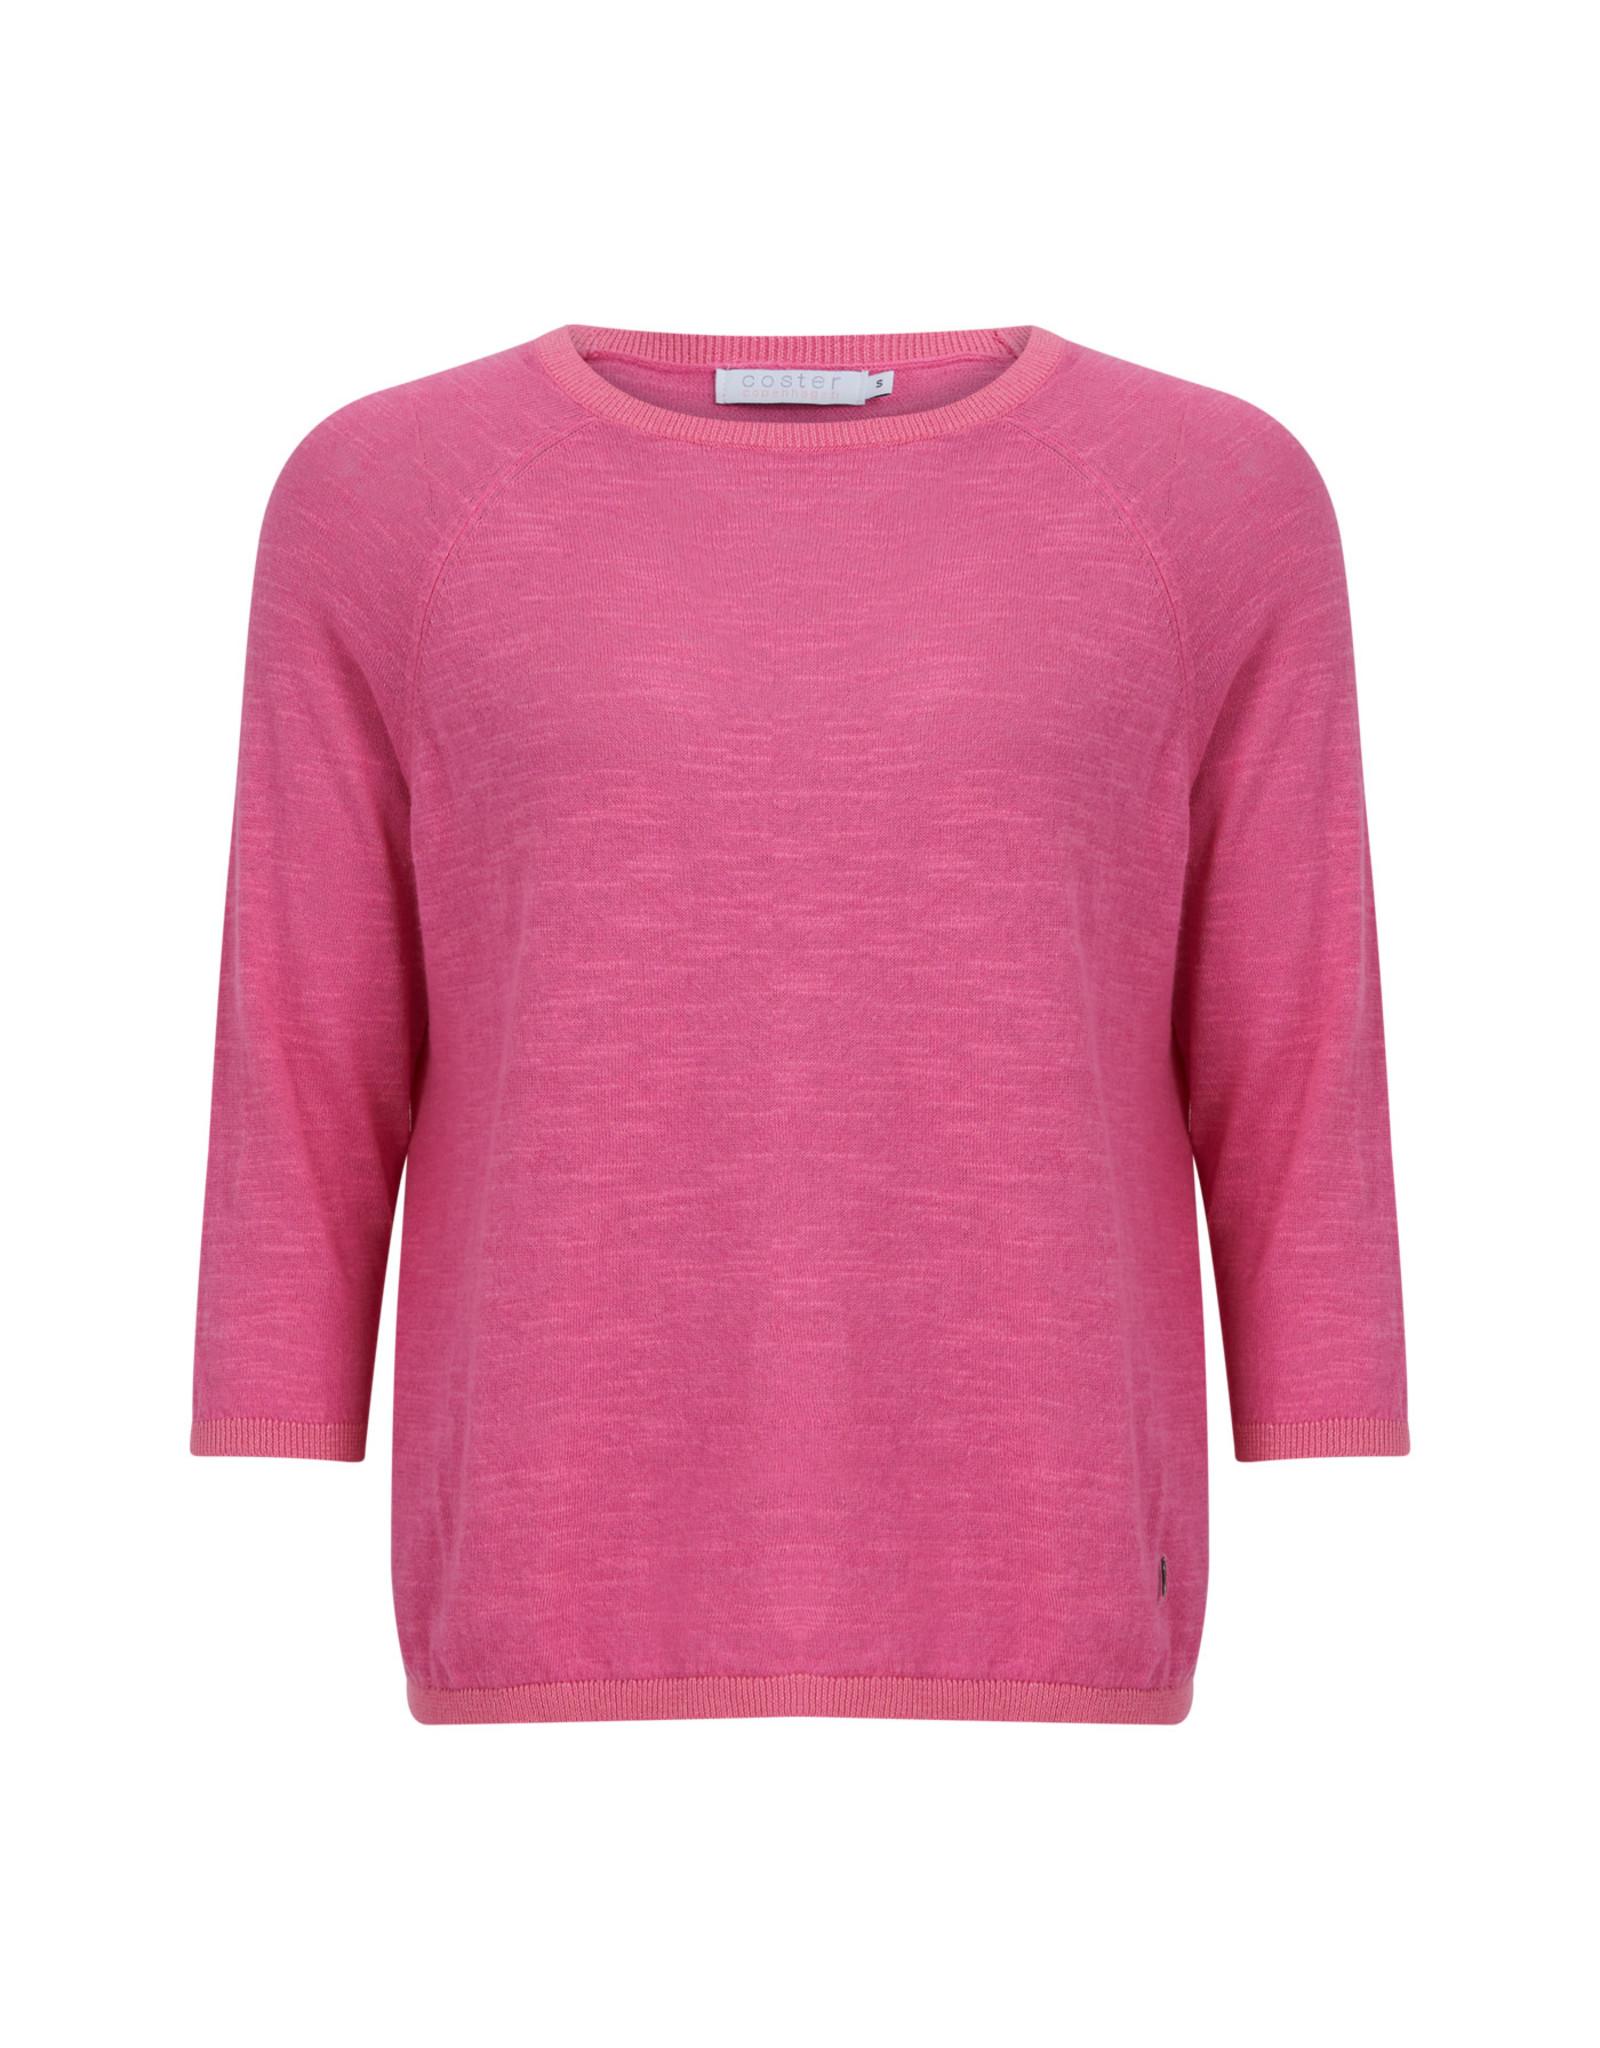 Coster Copenhagen Trui Persian Pink